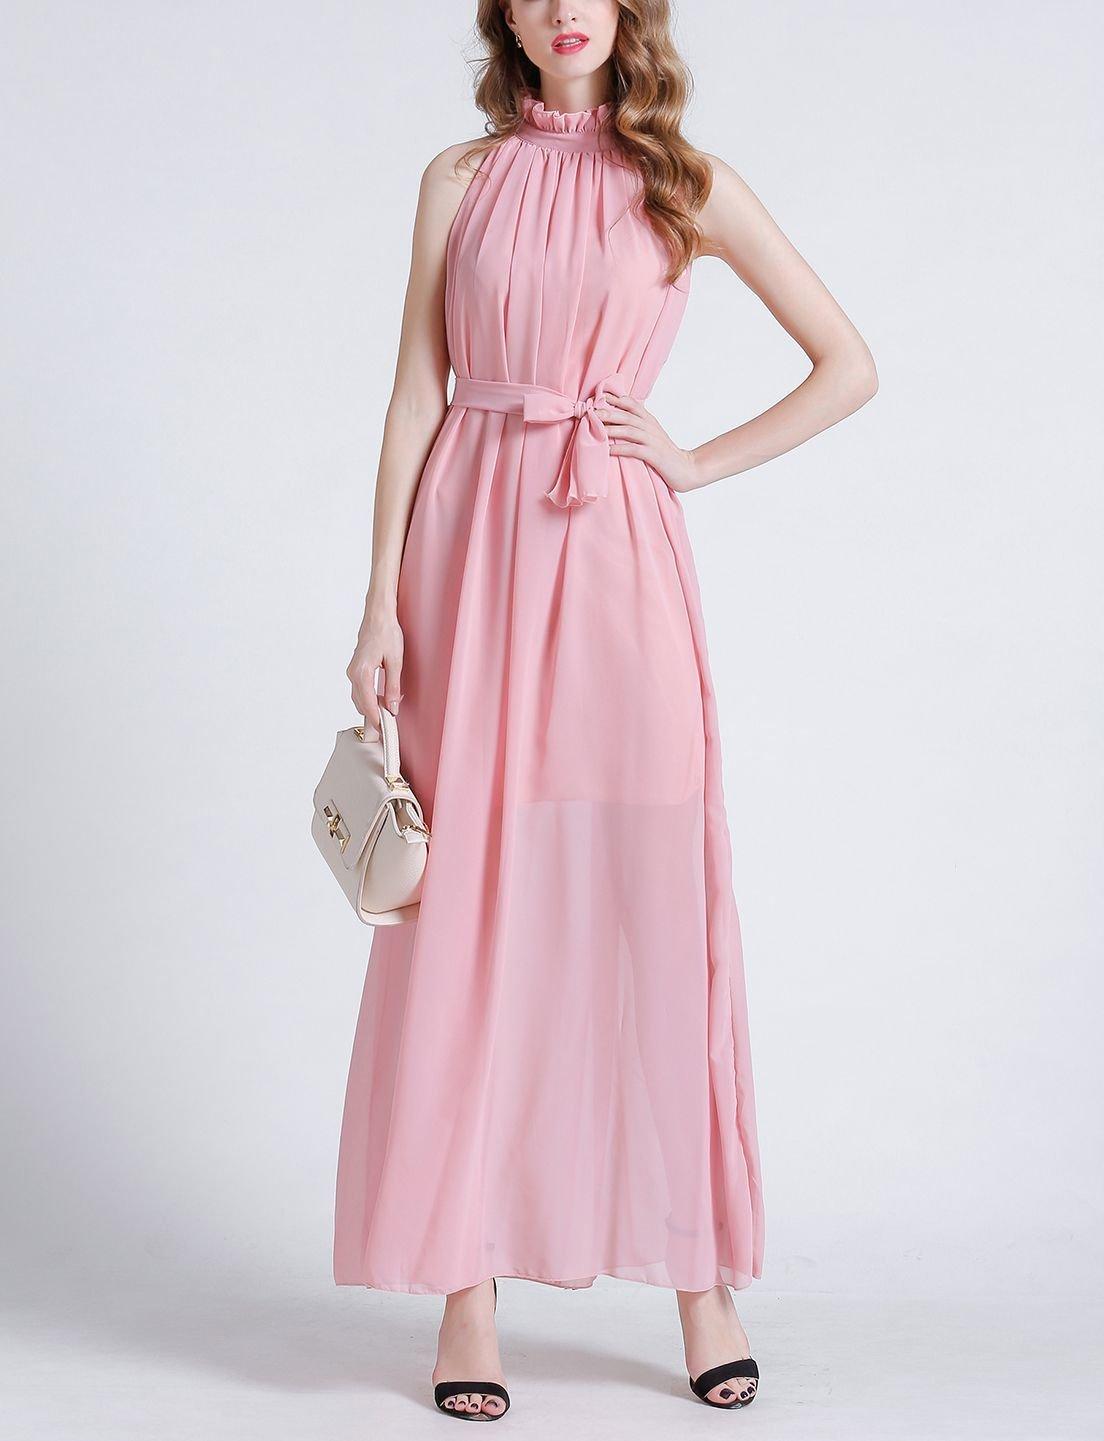 Gorgeous Chiffon Formal Dress